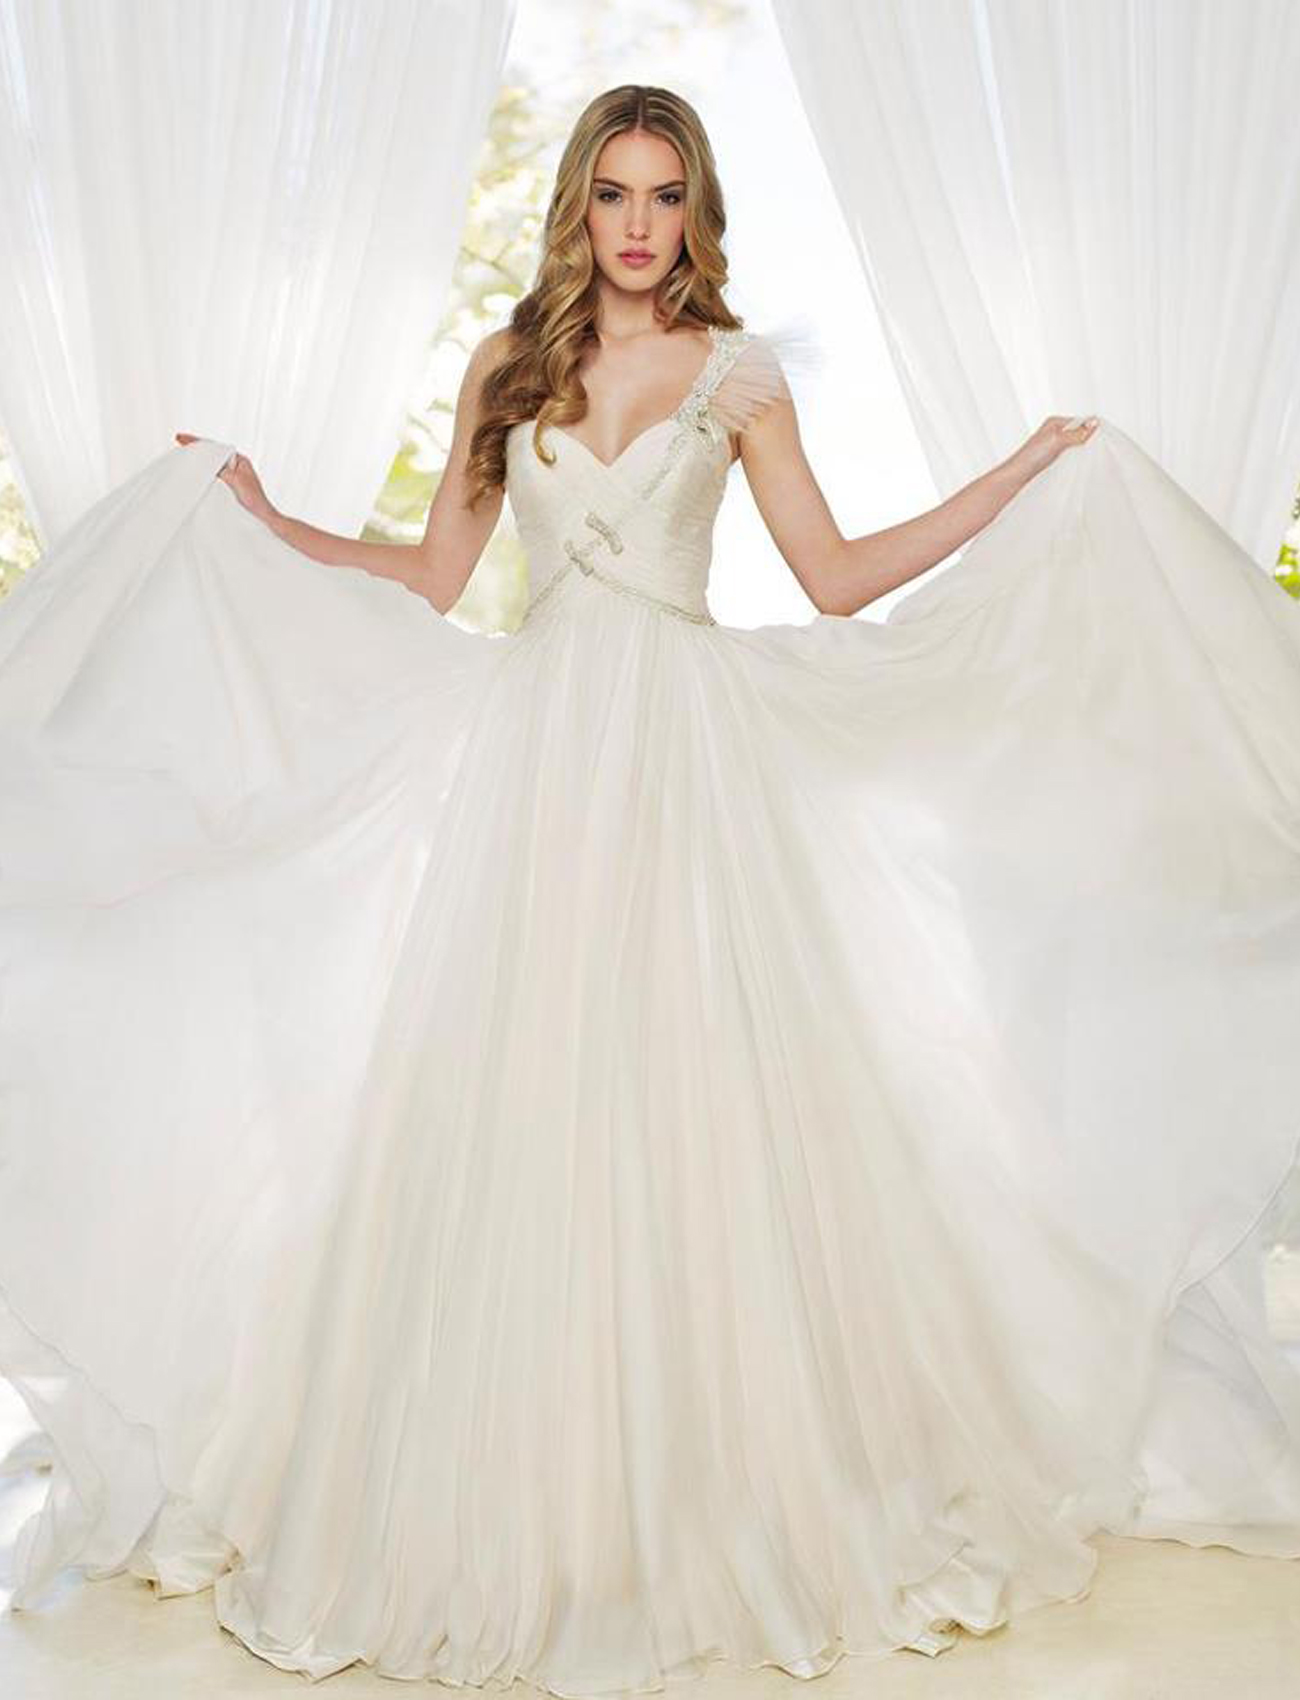 Joanne Panzarino 2012 Fall Bridal Collection